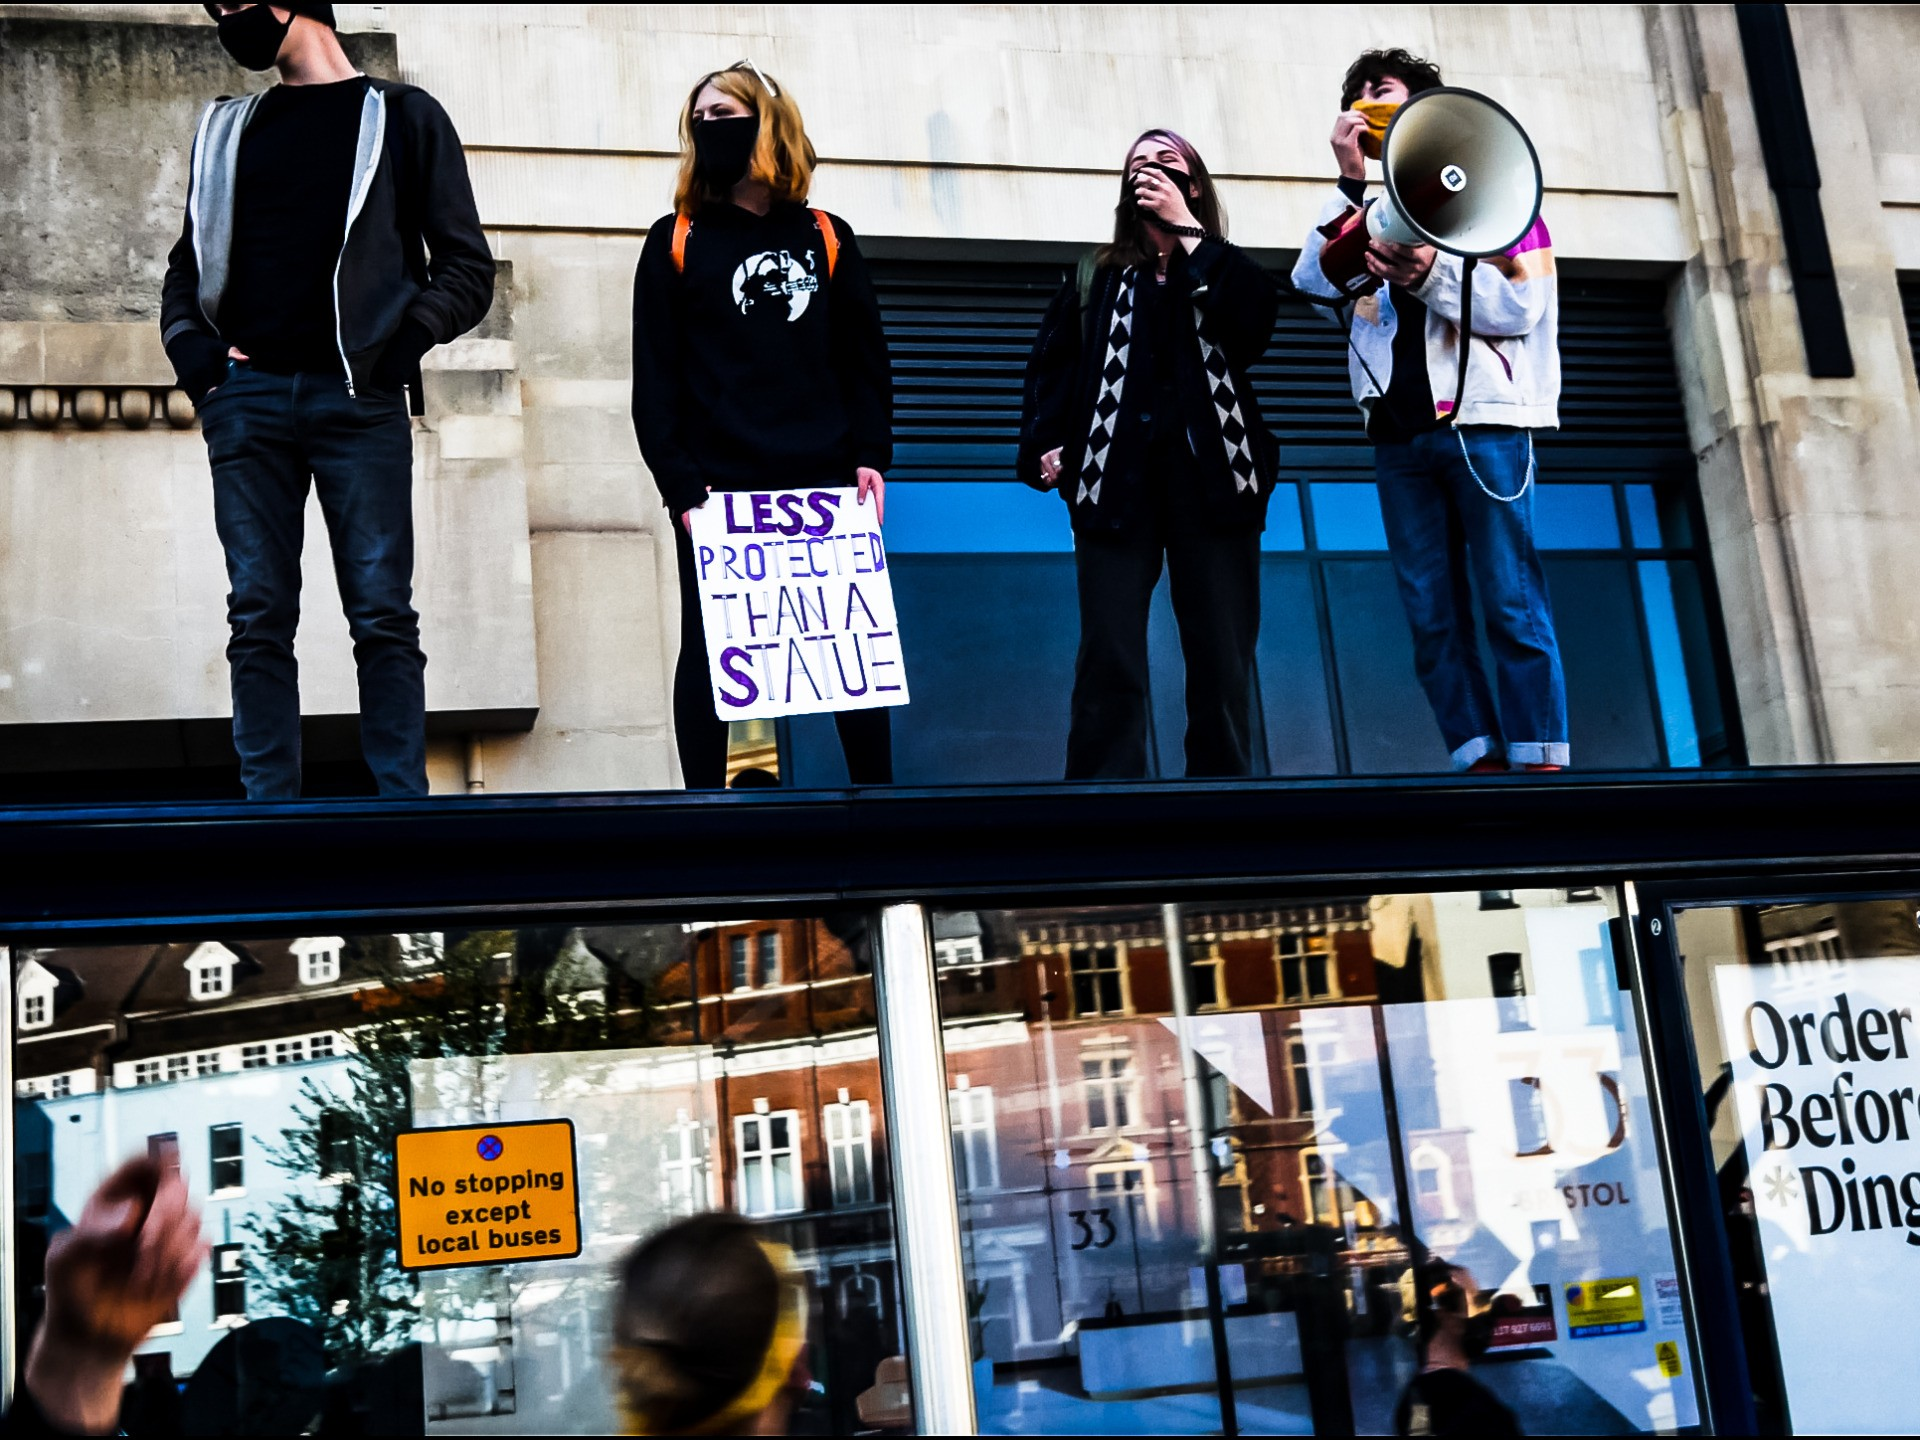 Protesters climb on a Bristol bus station during a #KillTheBill protest on Saturday, April 3, 2020. Kurt Zindulka, Breitbart News